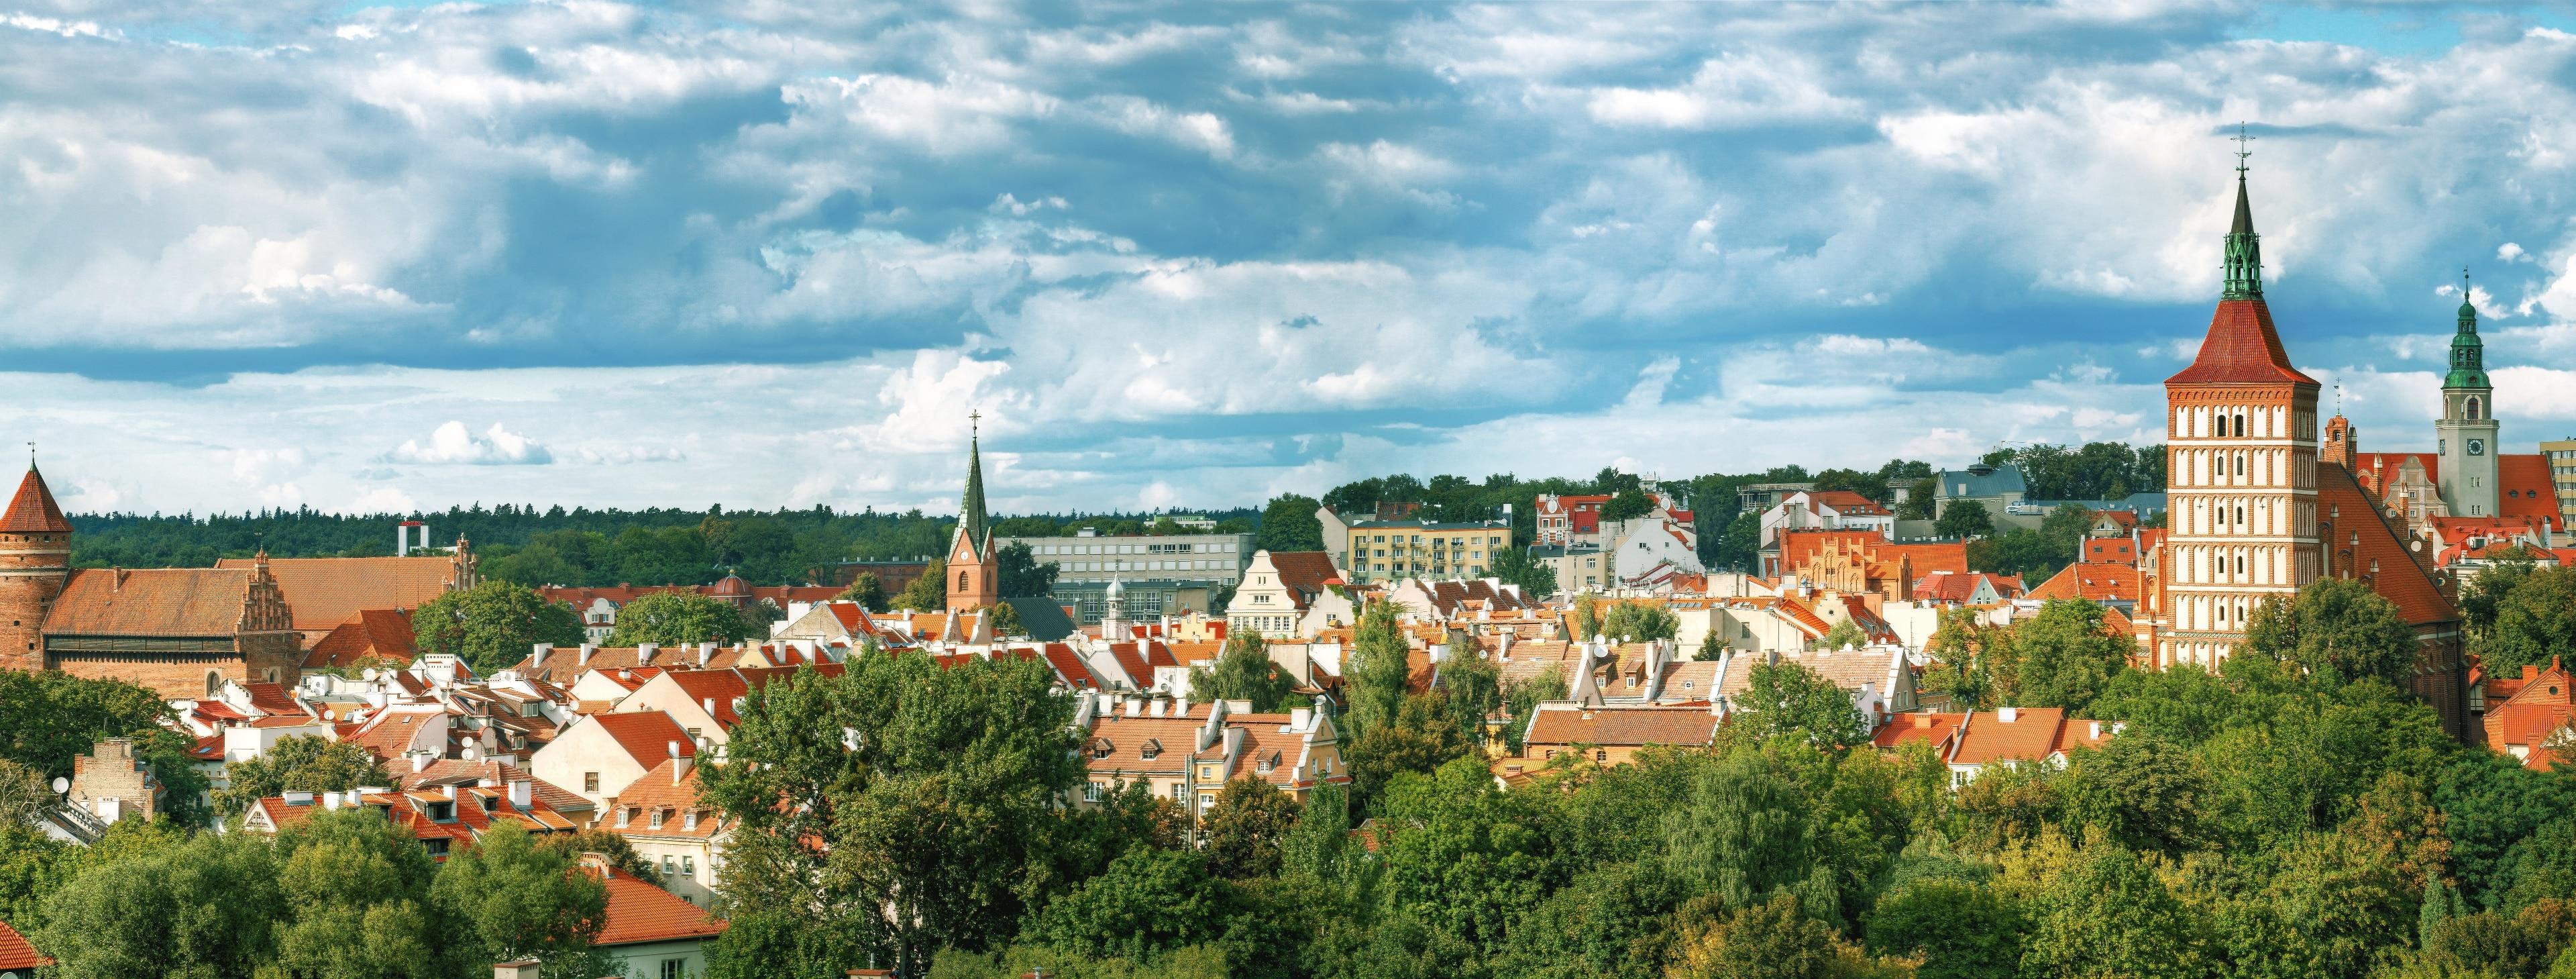 Ermland-Masuriens vojvodskap, Polen